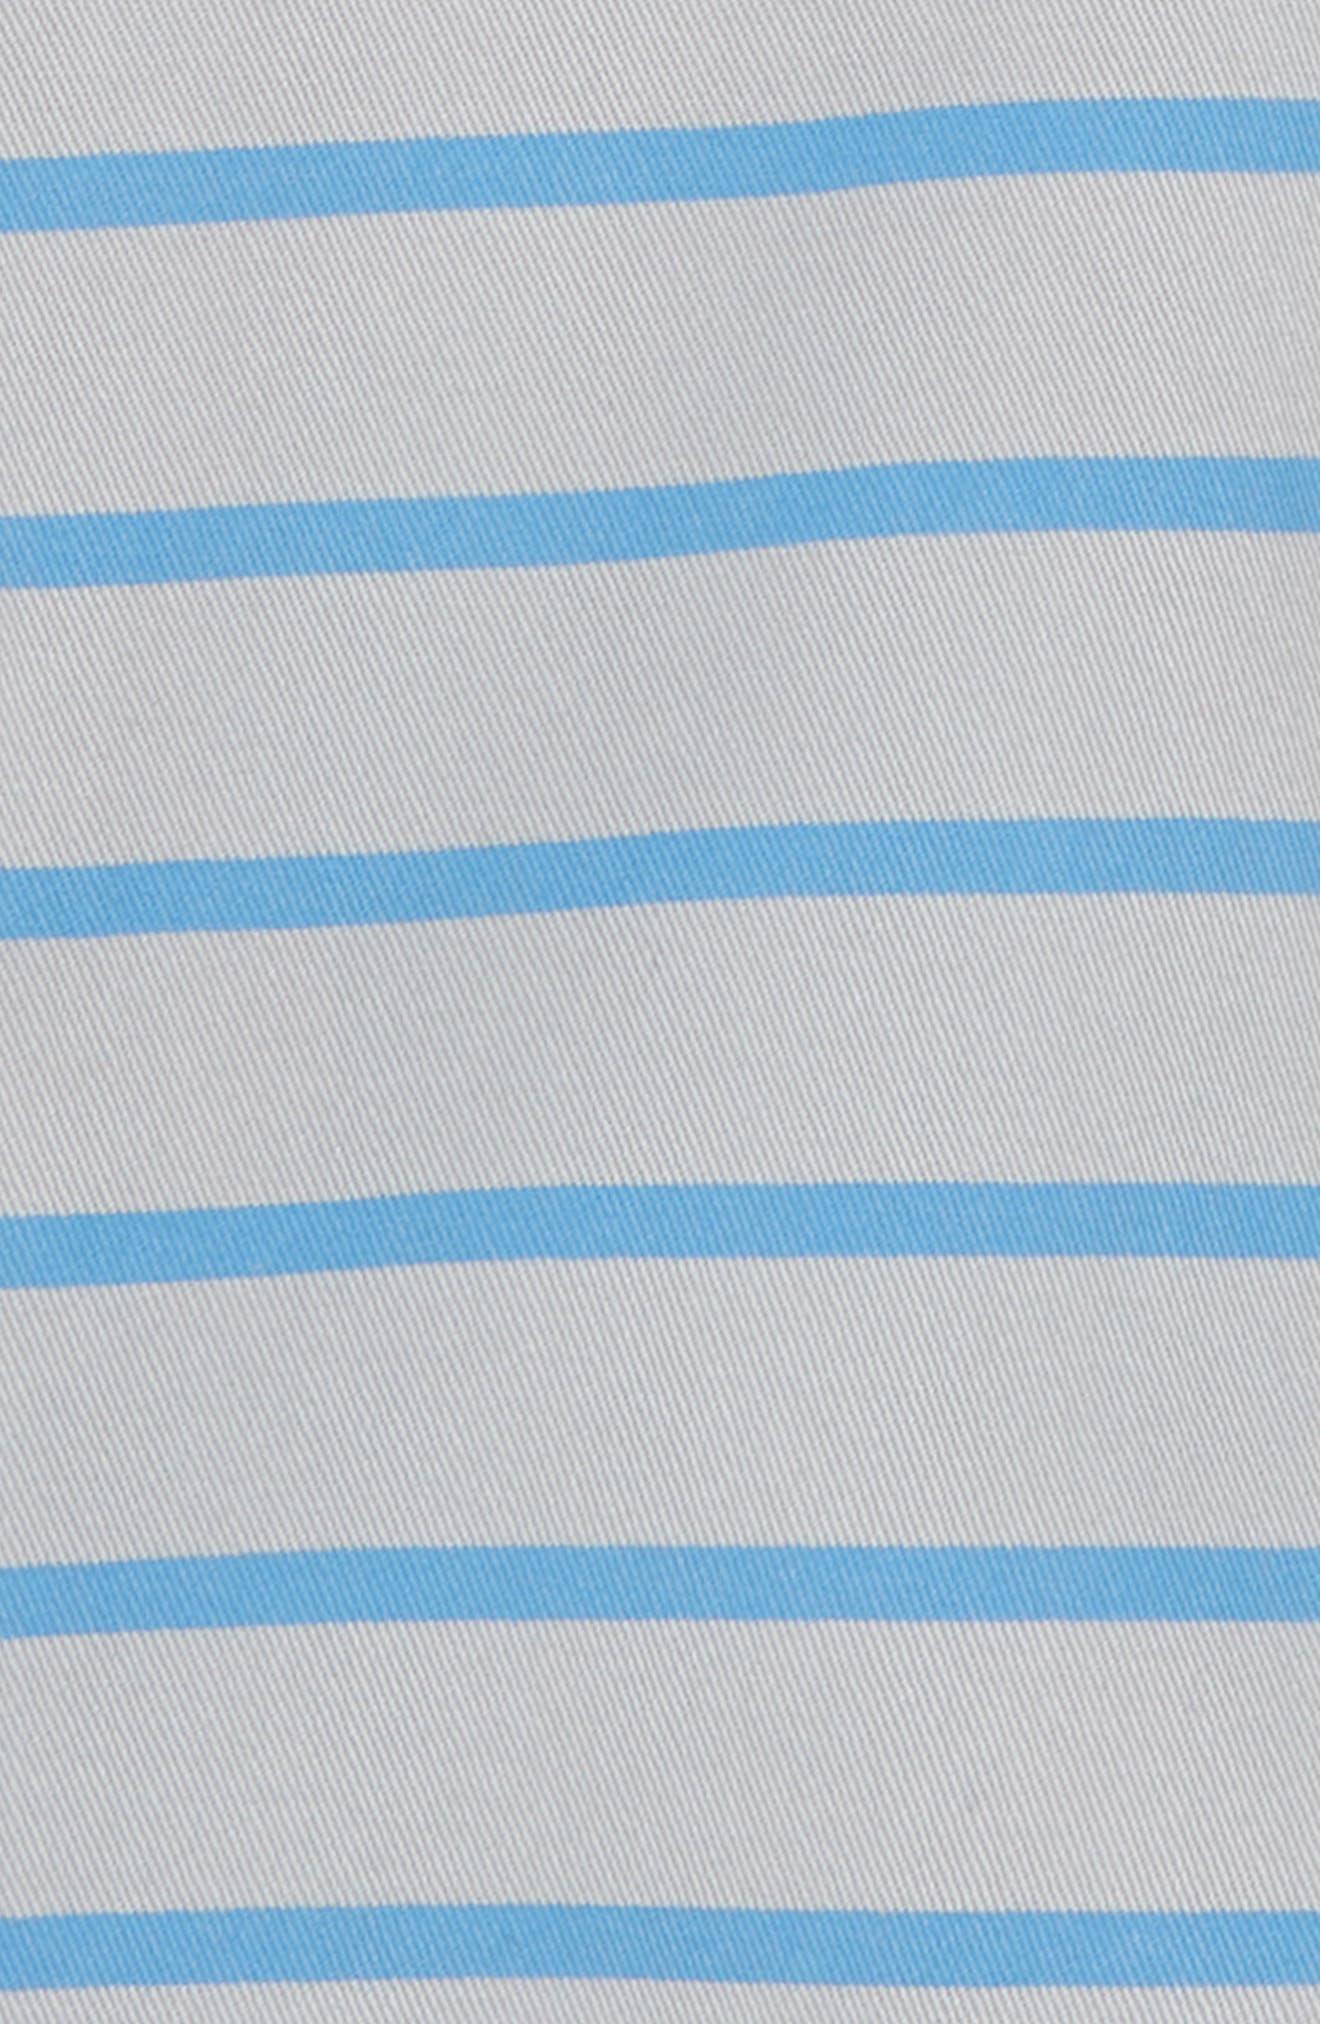 Waiku Stripe Shorts,                             Alternate thumbnail 2, color,                             031